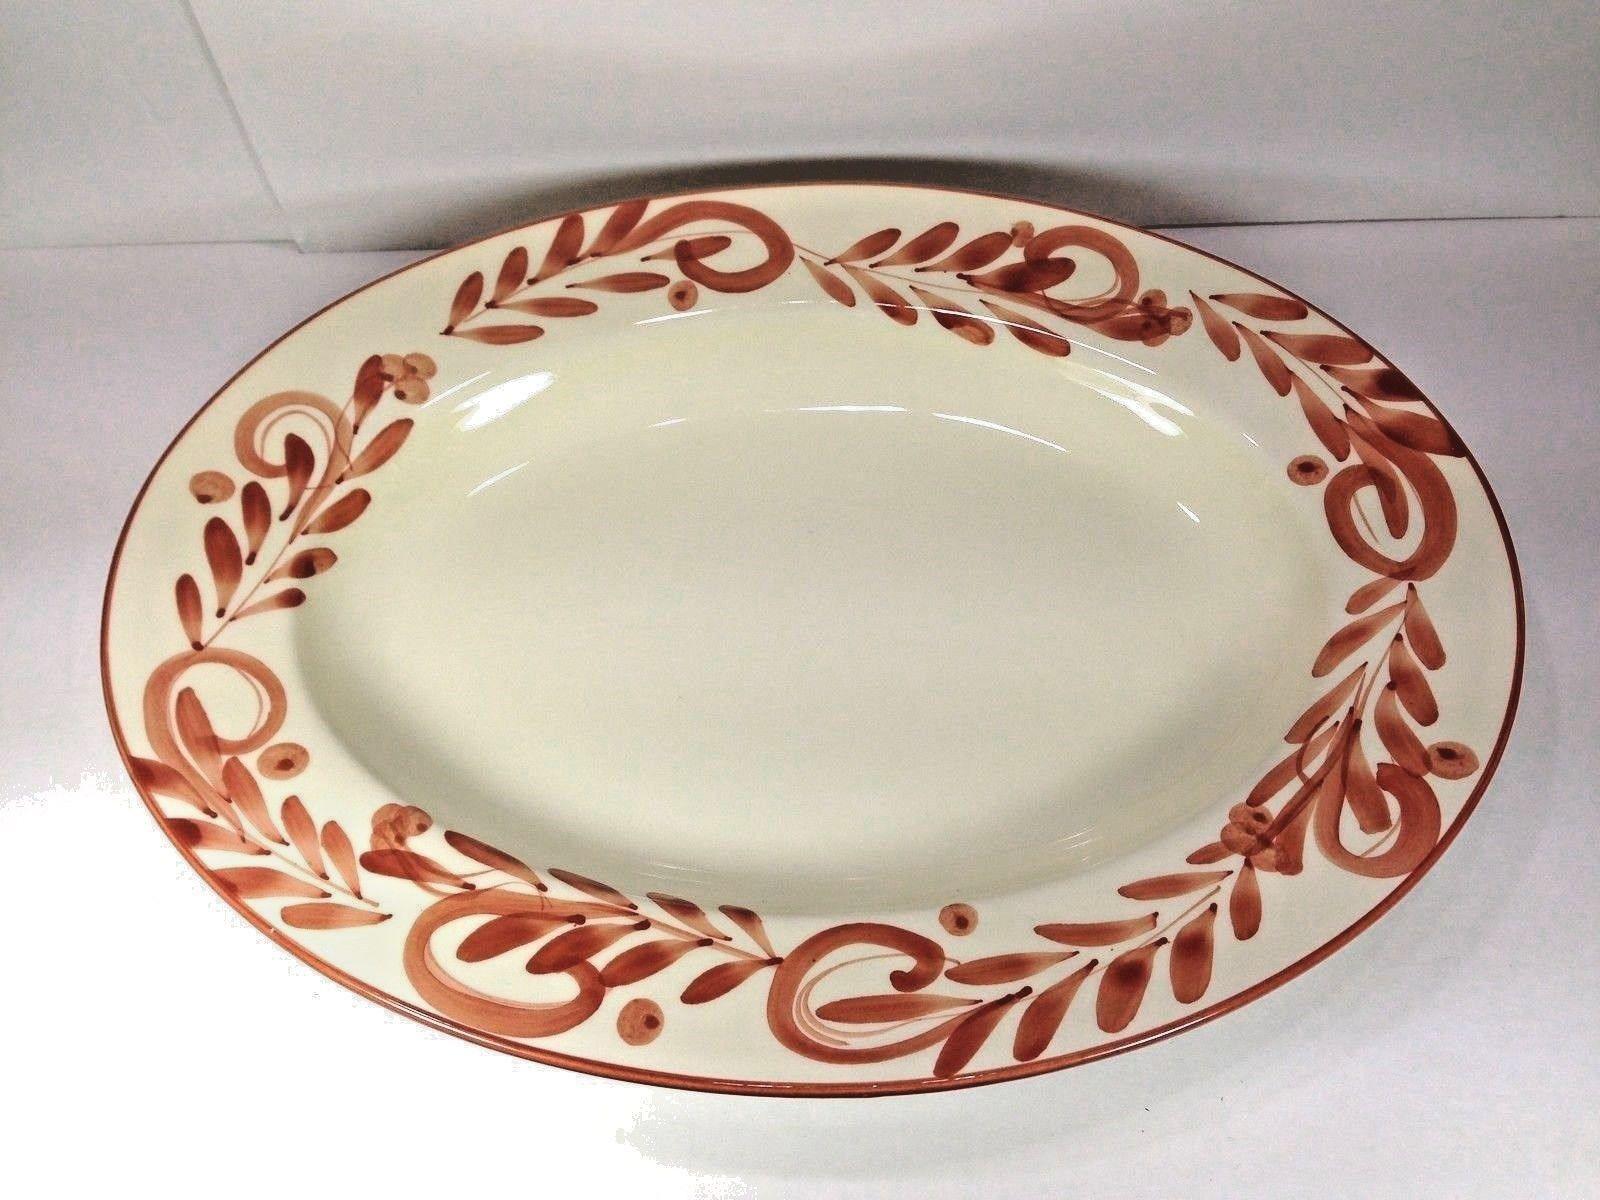 Bizzirri Italian Large Hand Painted Oval Platter / Bowl 18 1/2\  X 14 & Bizzirri Italian Large Hand Painted Oval Platter / Bowl 18 1/2\